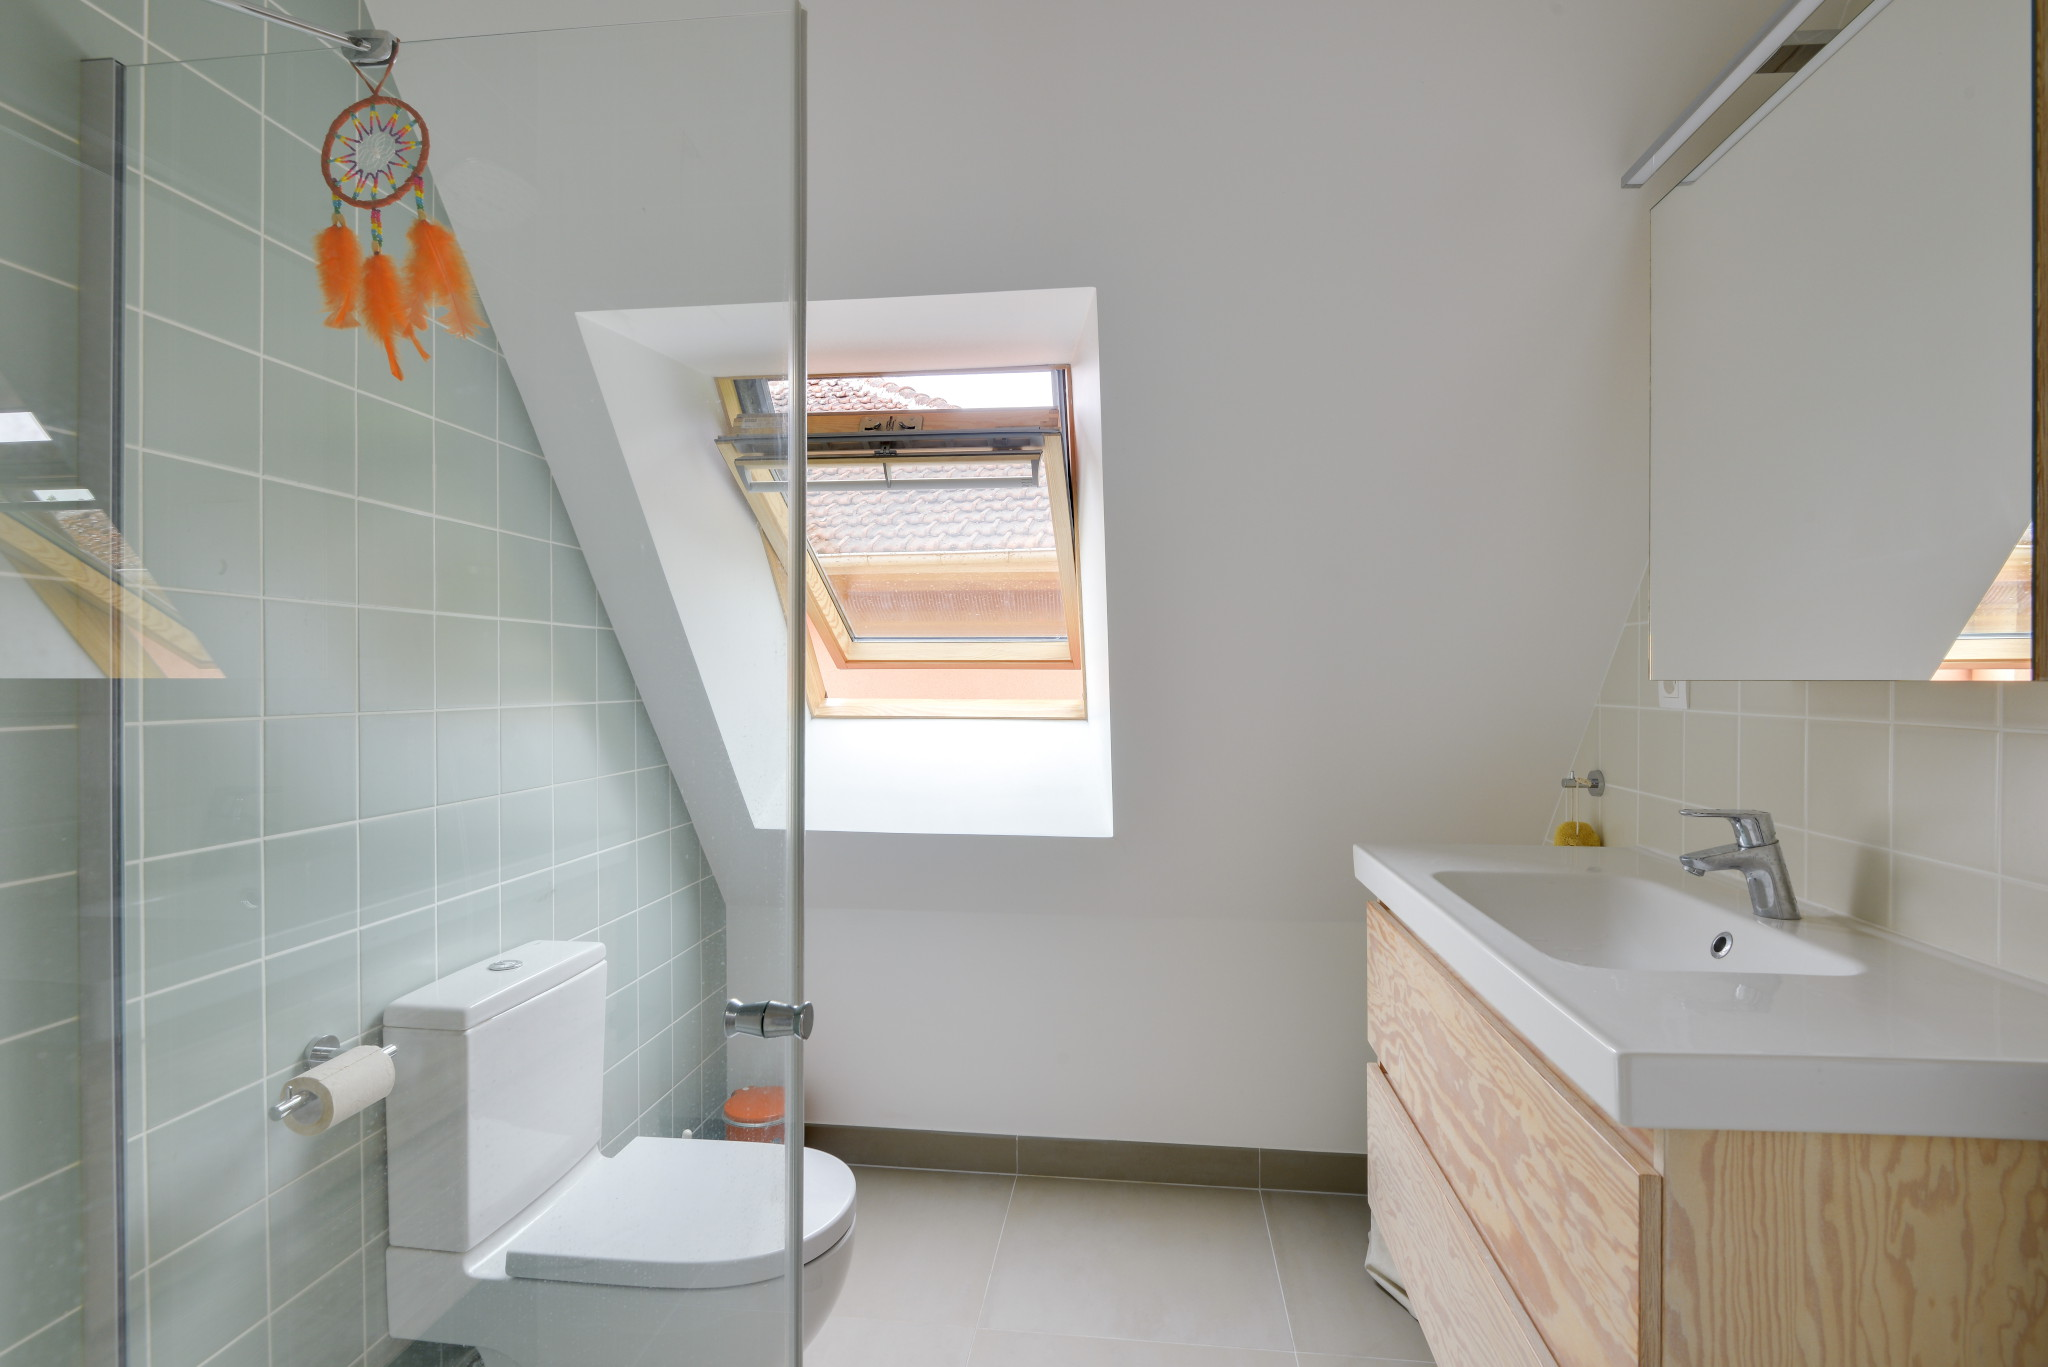 Nonjetable-Meuble-de-Salle-de-Douche-sur-Mesure-et-Armoire-Miroir